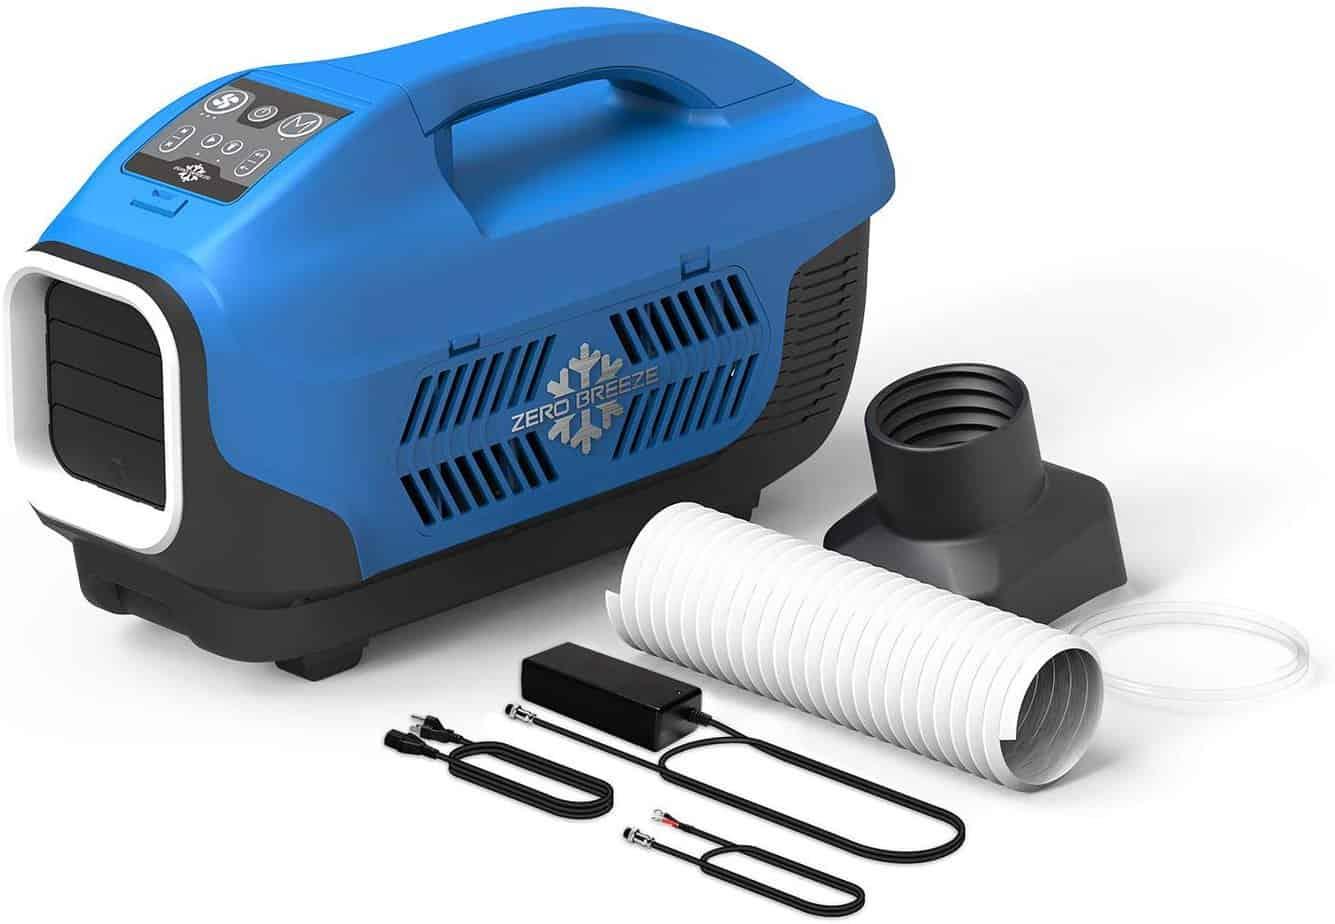 Zero breeze portable conditioner - photo 1